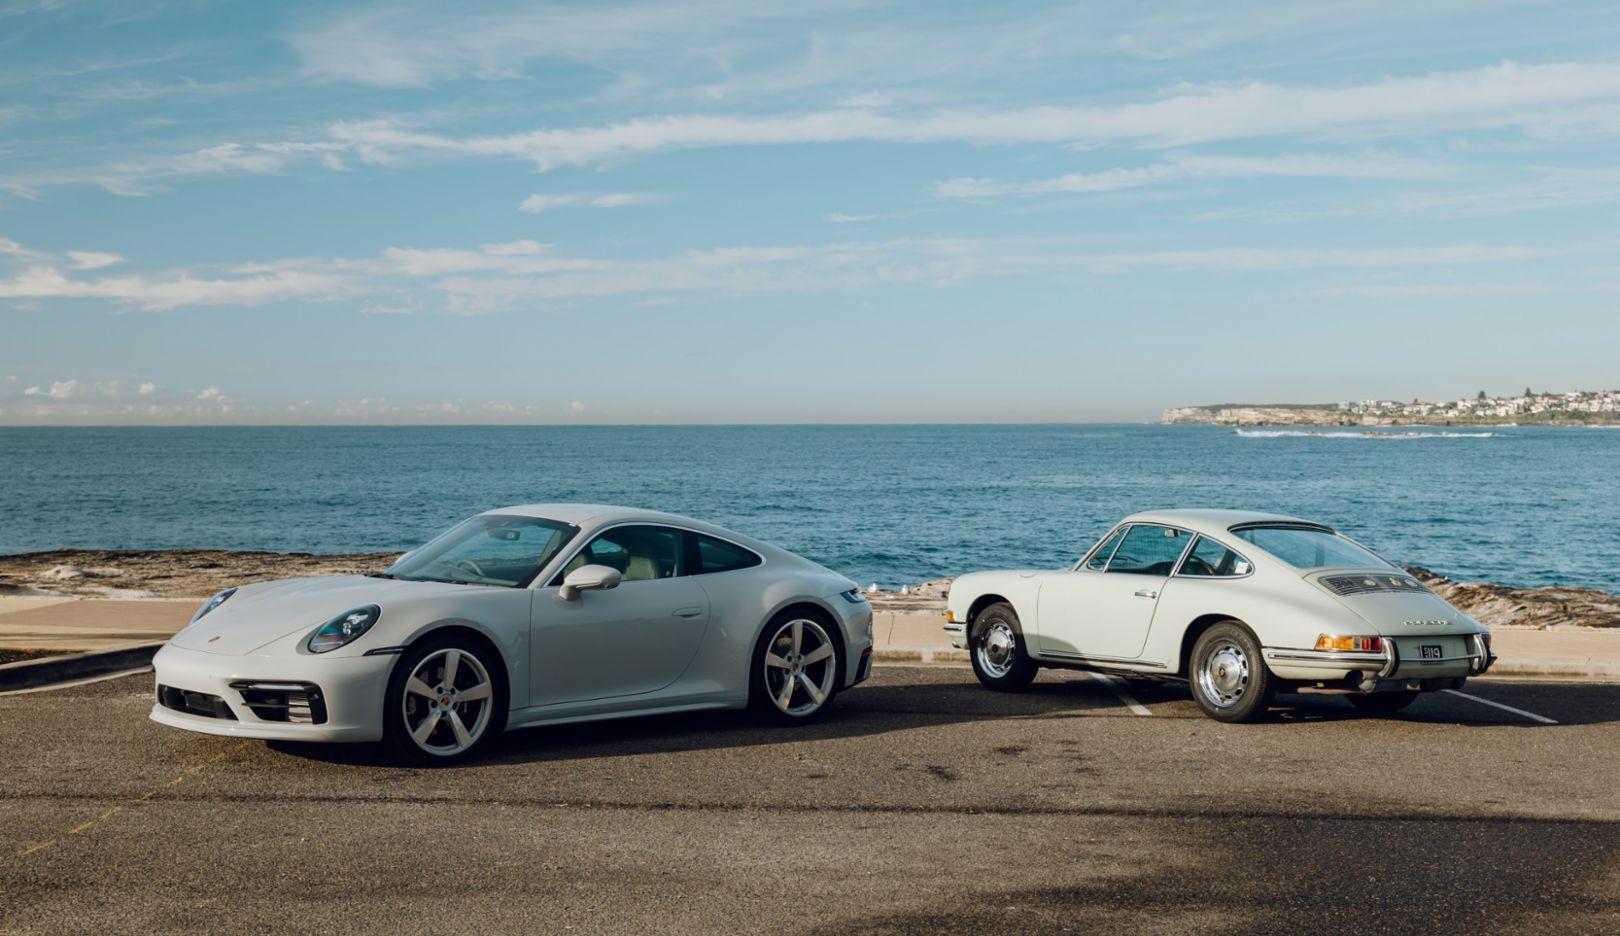 Australia's first 911 reimagined by Porsche Exclusive Manufaktur - Image 8